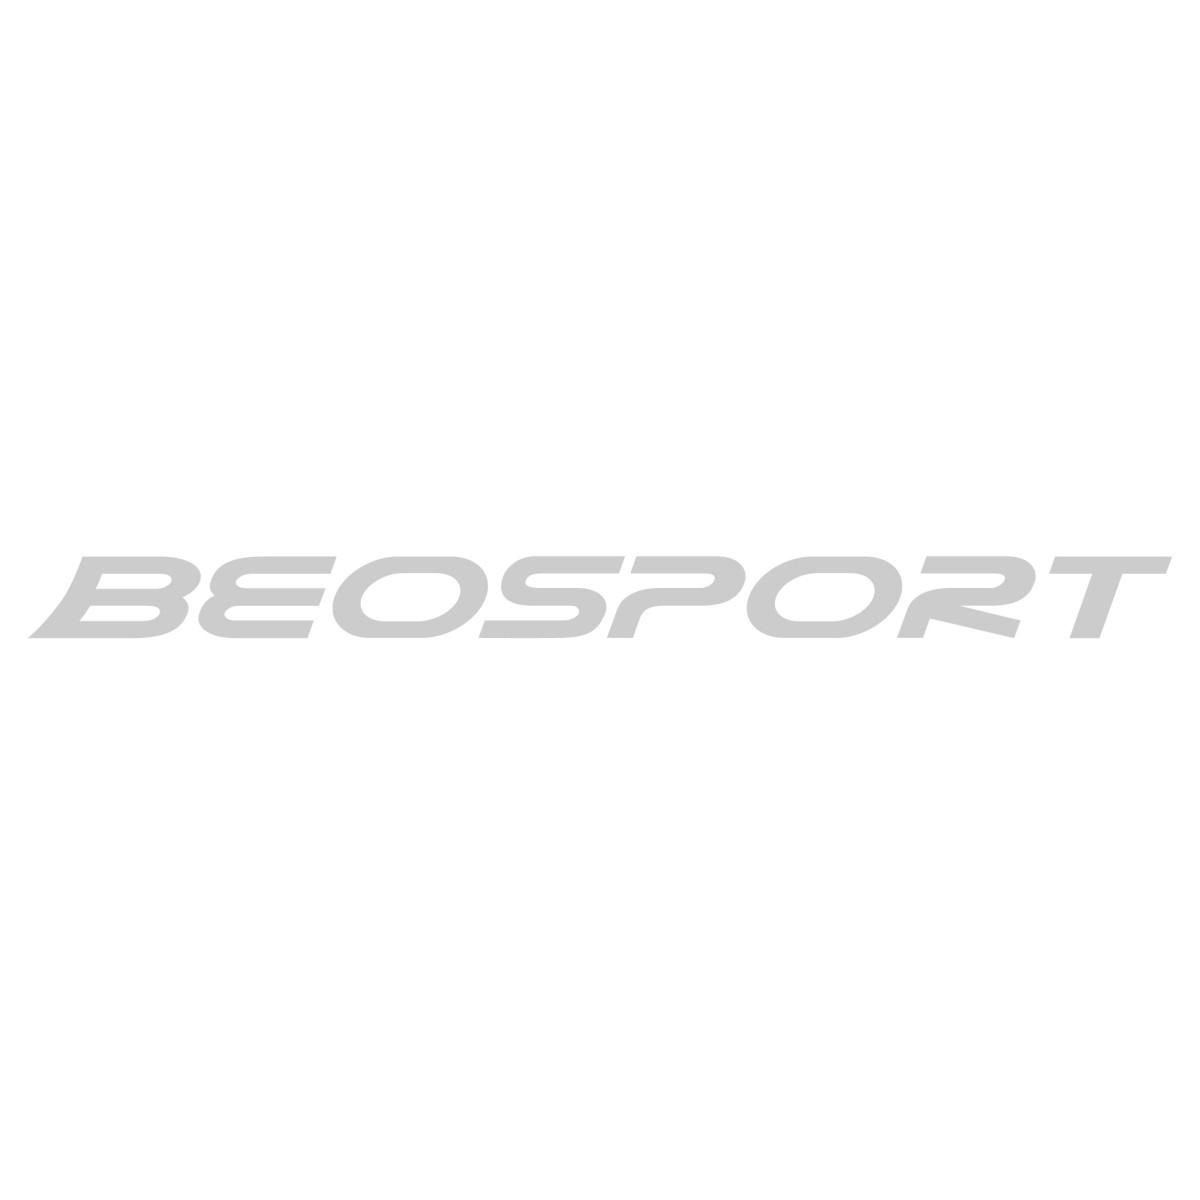 The North Face Aphrodite pantalone